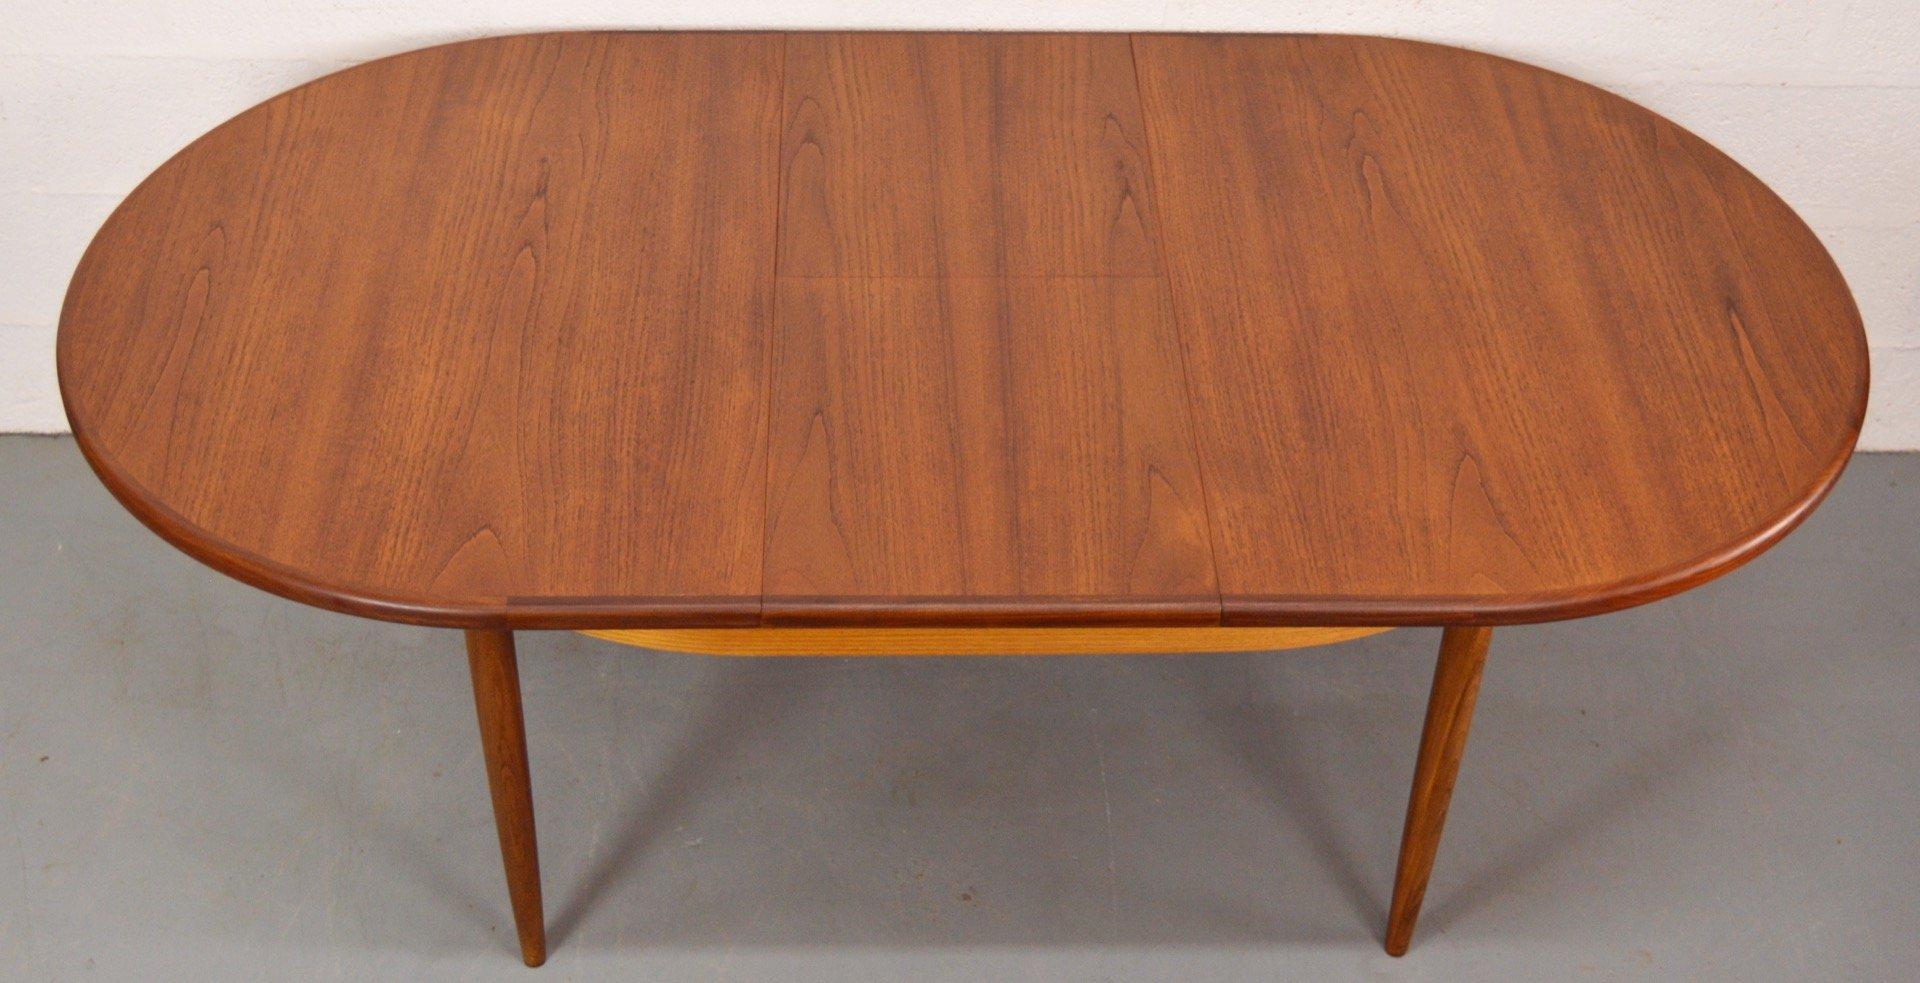 table de salle manger ovale extensible fresco mid century en teck de g plan angleterre 1960s. Black Bedroom Furniture Sets. Home Design Ideas